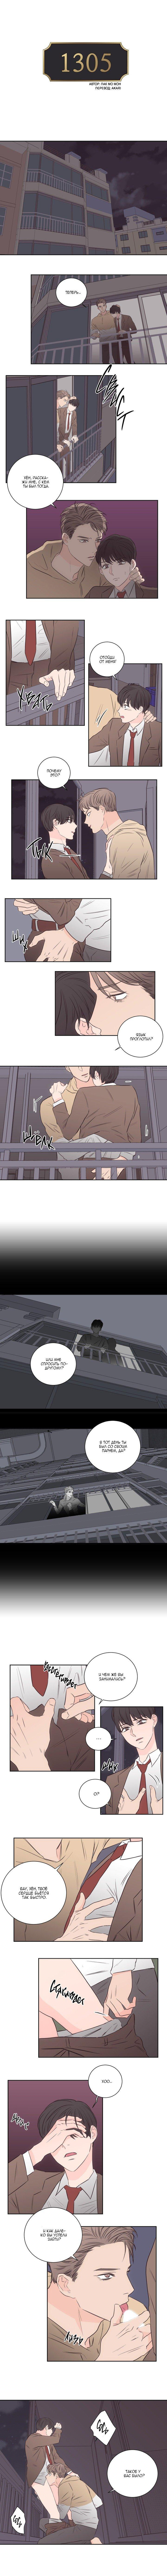 Манга 1305 - Глава 34 Страница 1